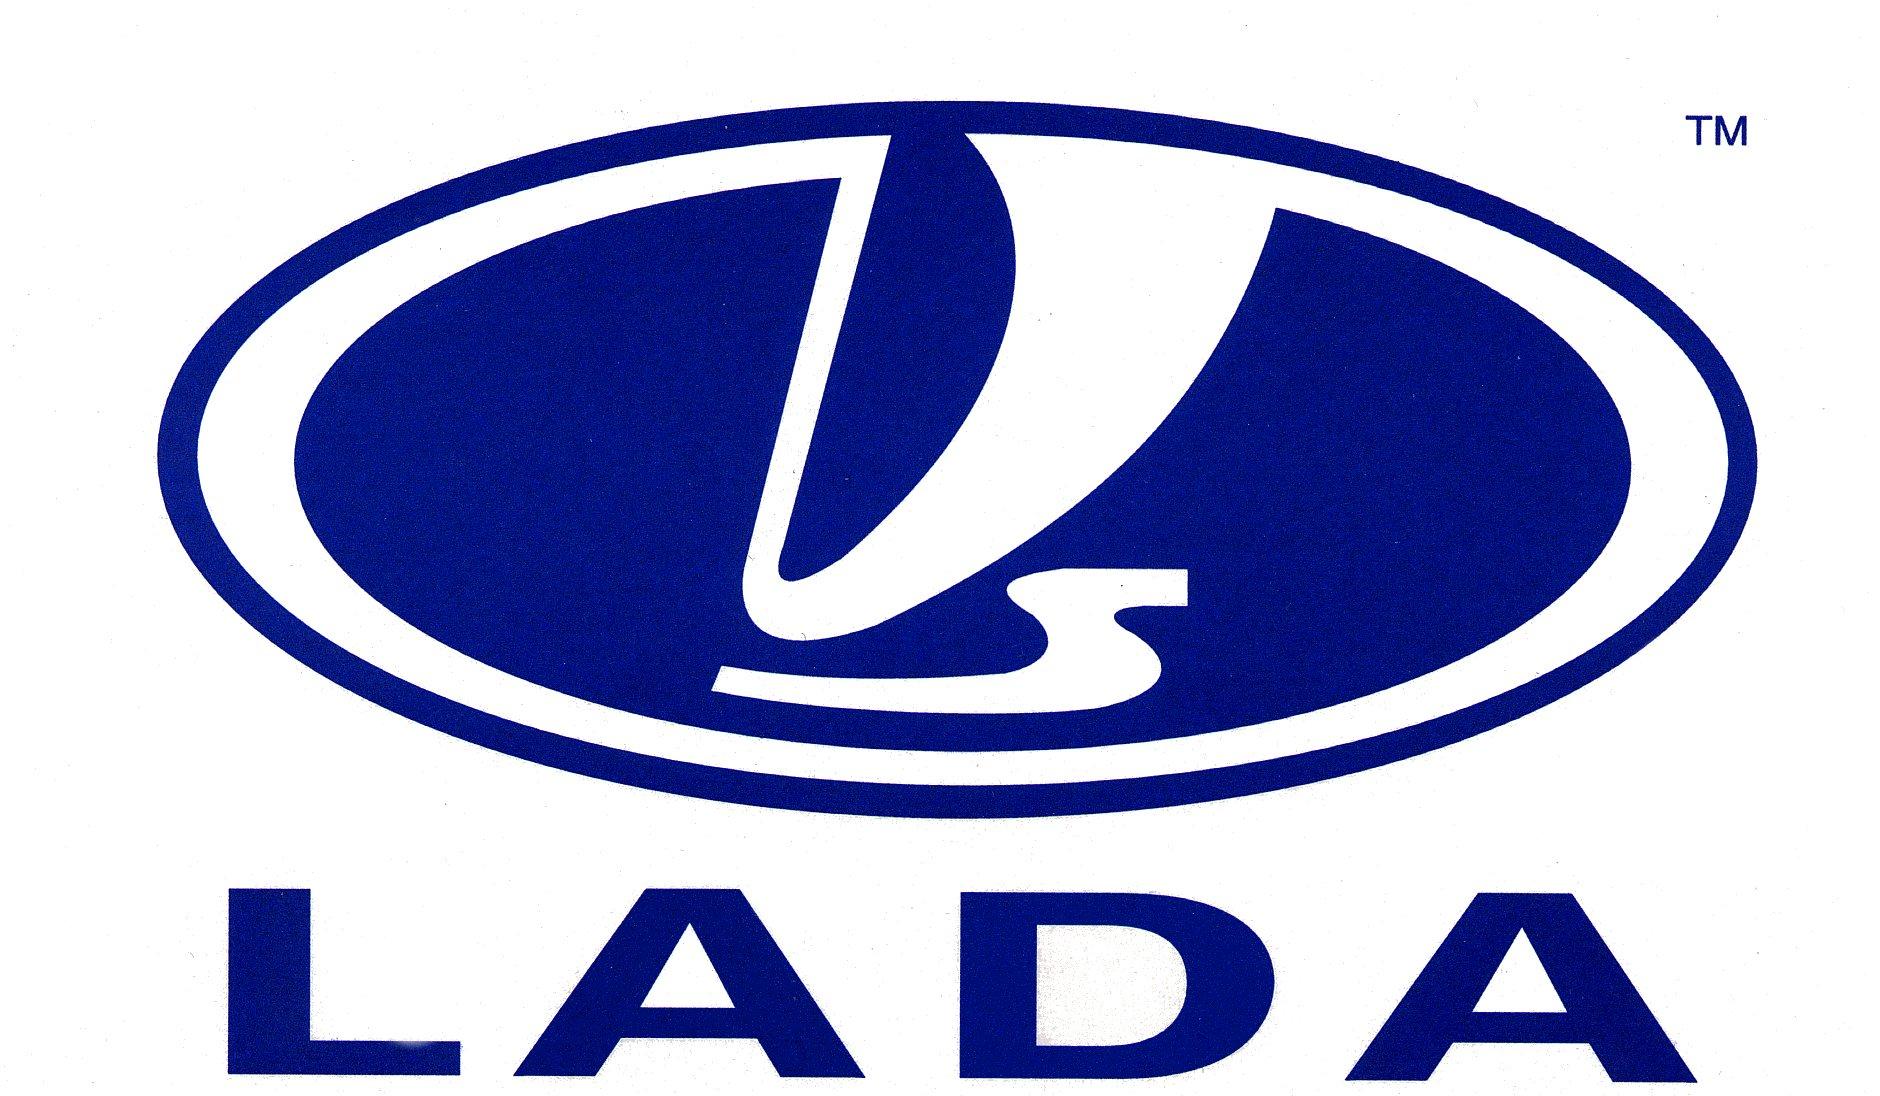 LADA logo wallpapers HD